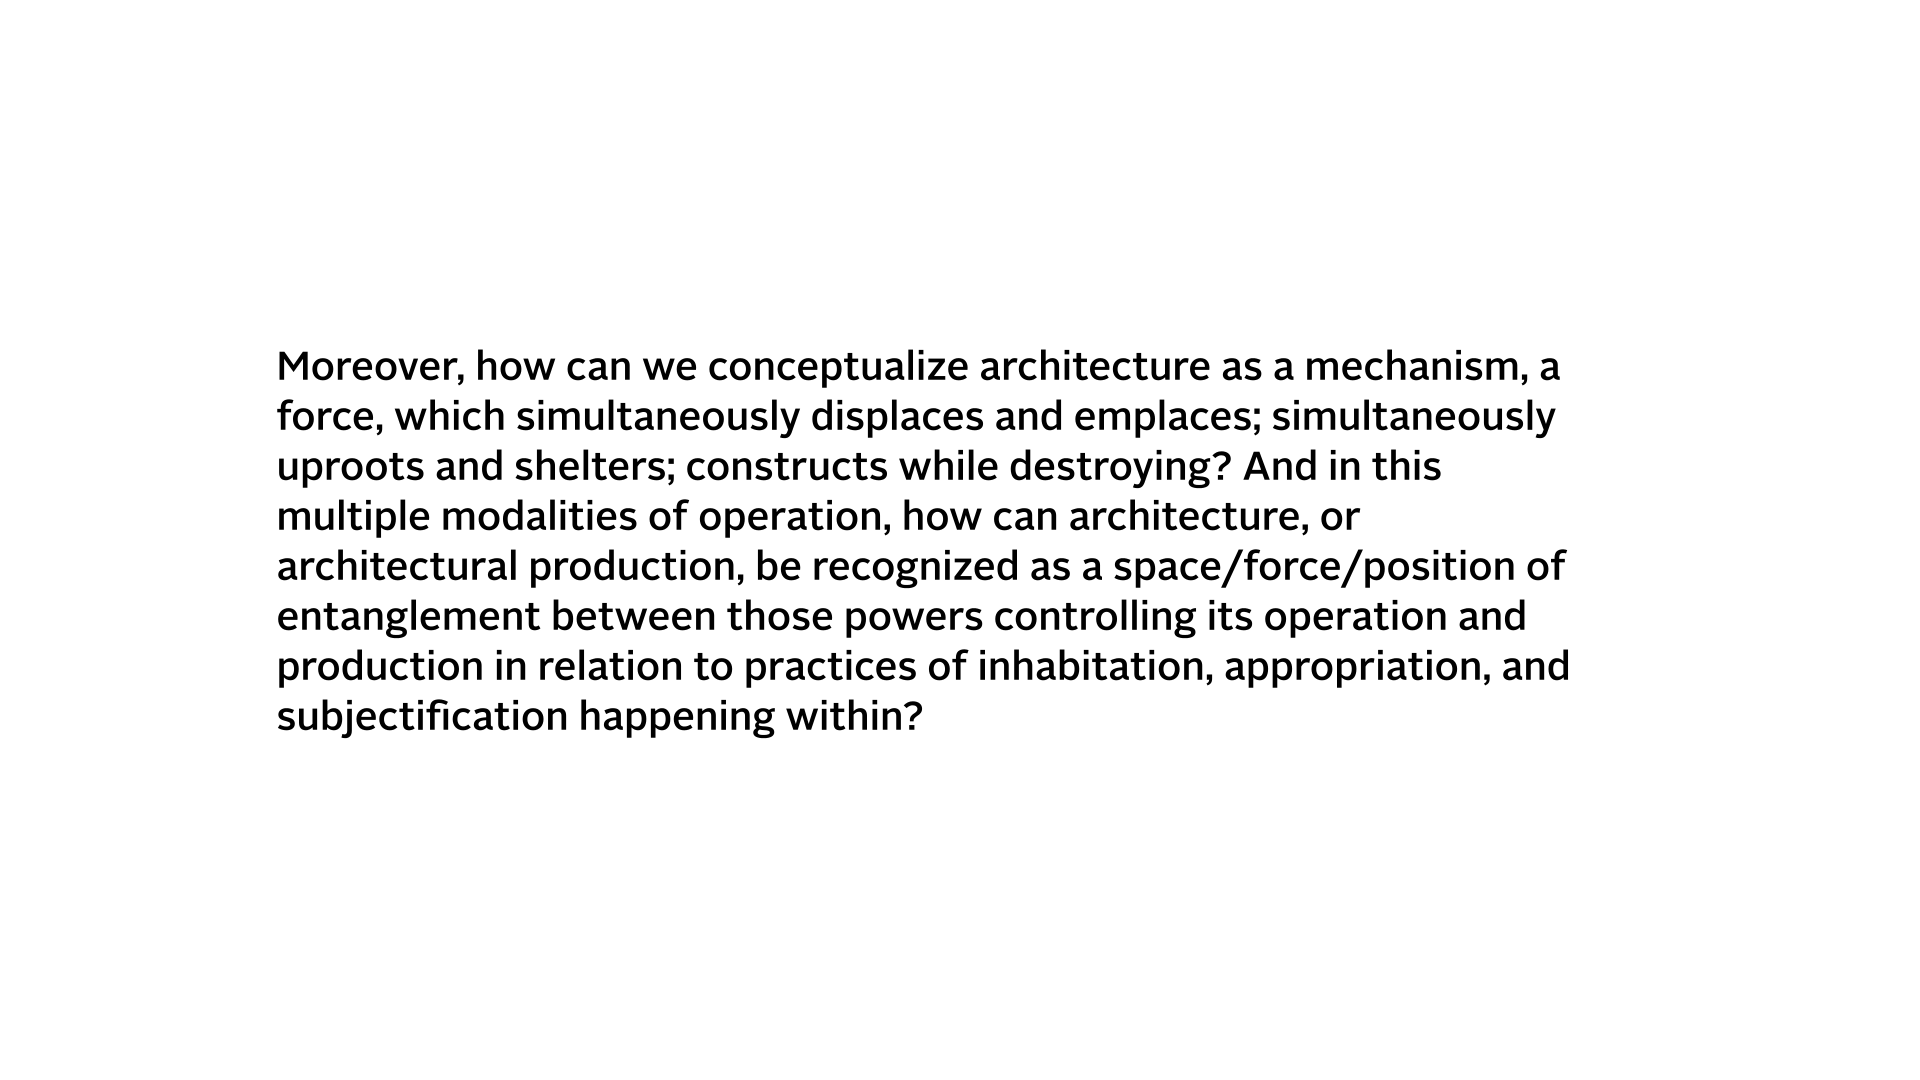 04_Concept_03